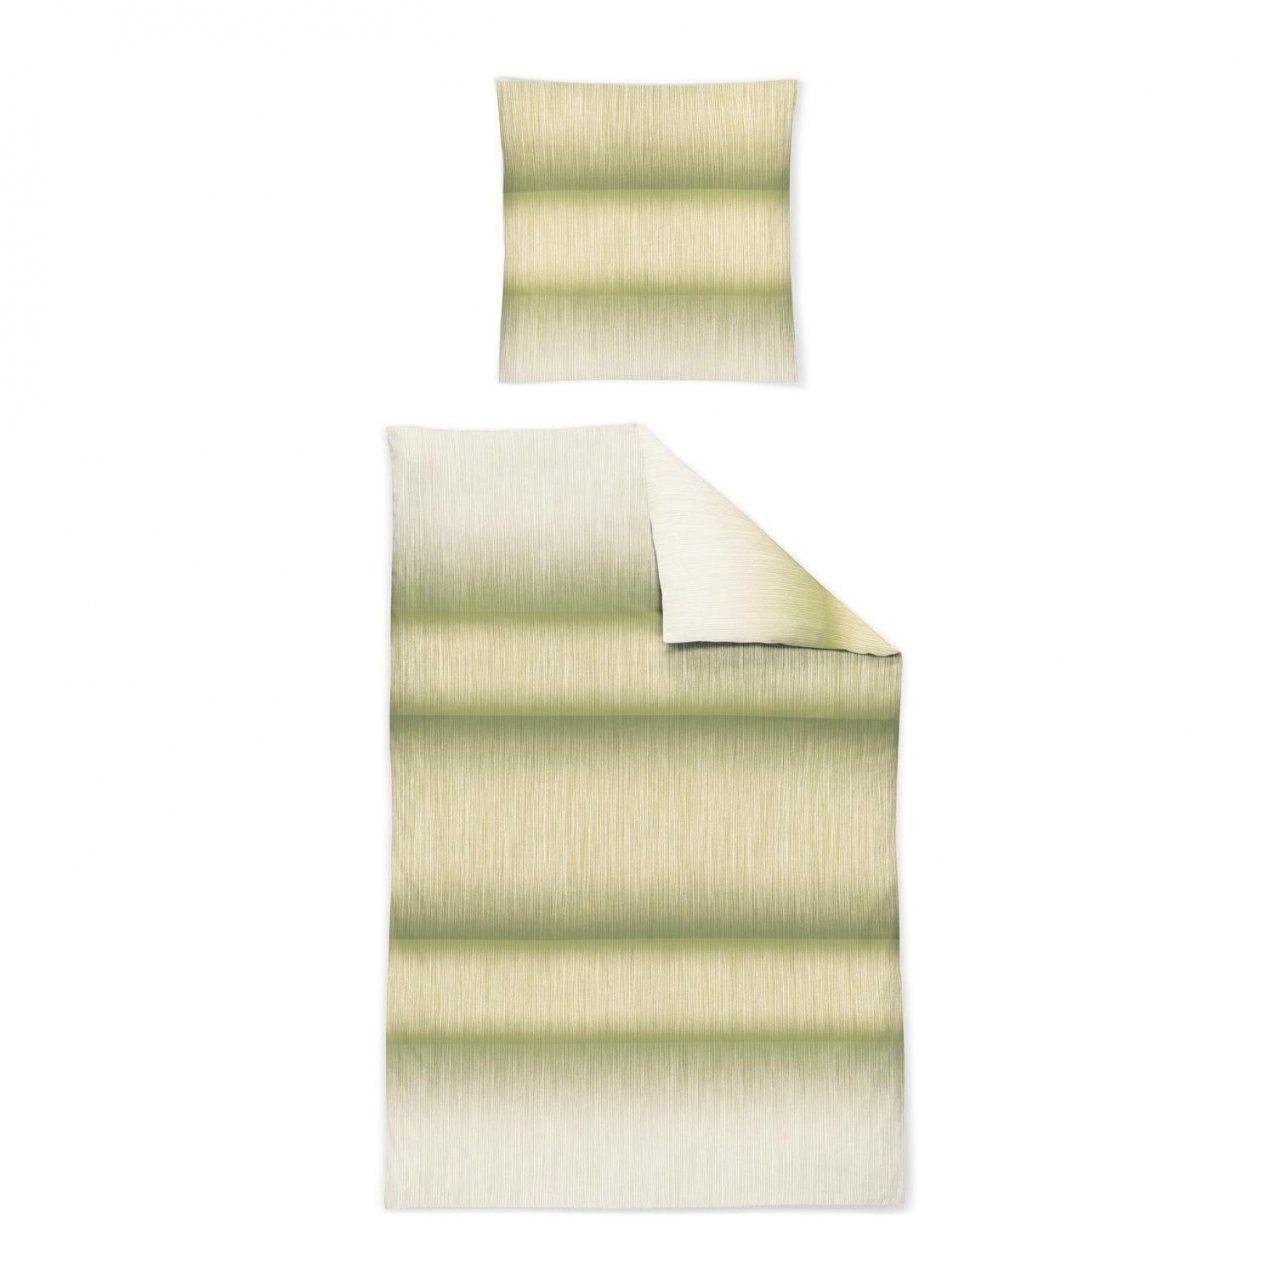 Irisette Capri Satin Bettwäsche Set In Farbe Grün Um 19% Reduziert von Bettwäsche Irisette Reduziert Bild